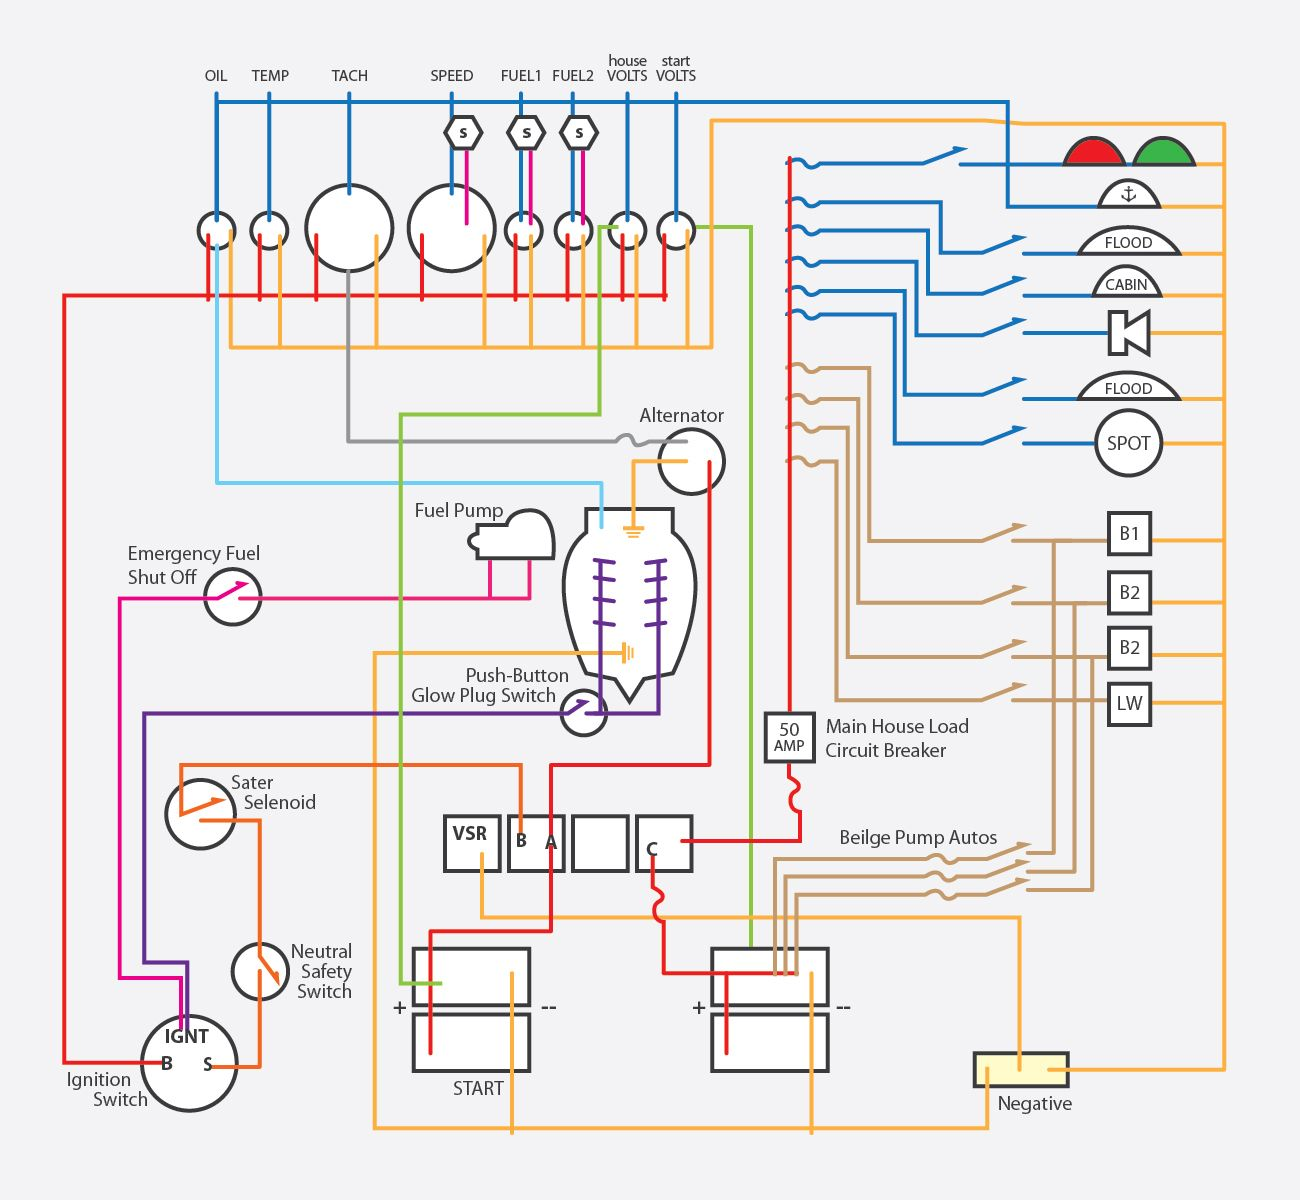 Triton Boat Fuse Box - Wiring Diagram Text parched-post -  parched-post.albergoristorantecanzo.it | Bass Tracker Pro 16 Wiring Diagram |  | parched-post.albergoristorantecanzo.it